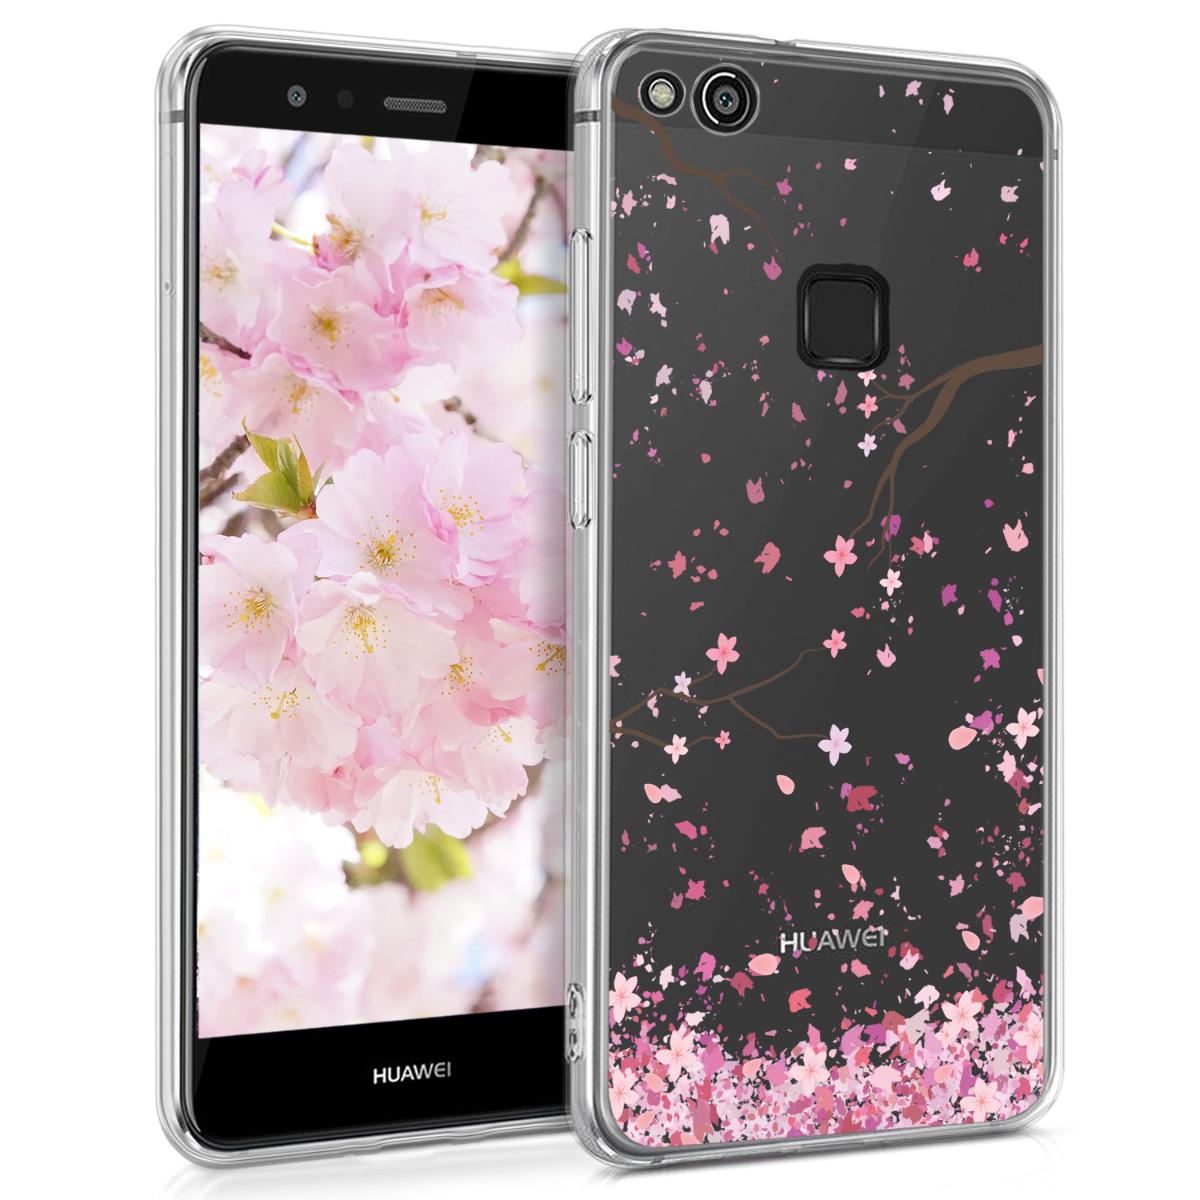 KW Θήκη Σιλικόνης Huawei P10 Lite - Light Pink / Dark Brown / Transparent (41375.57)